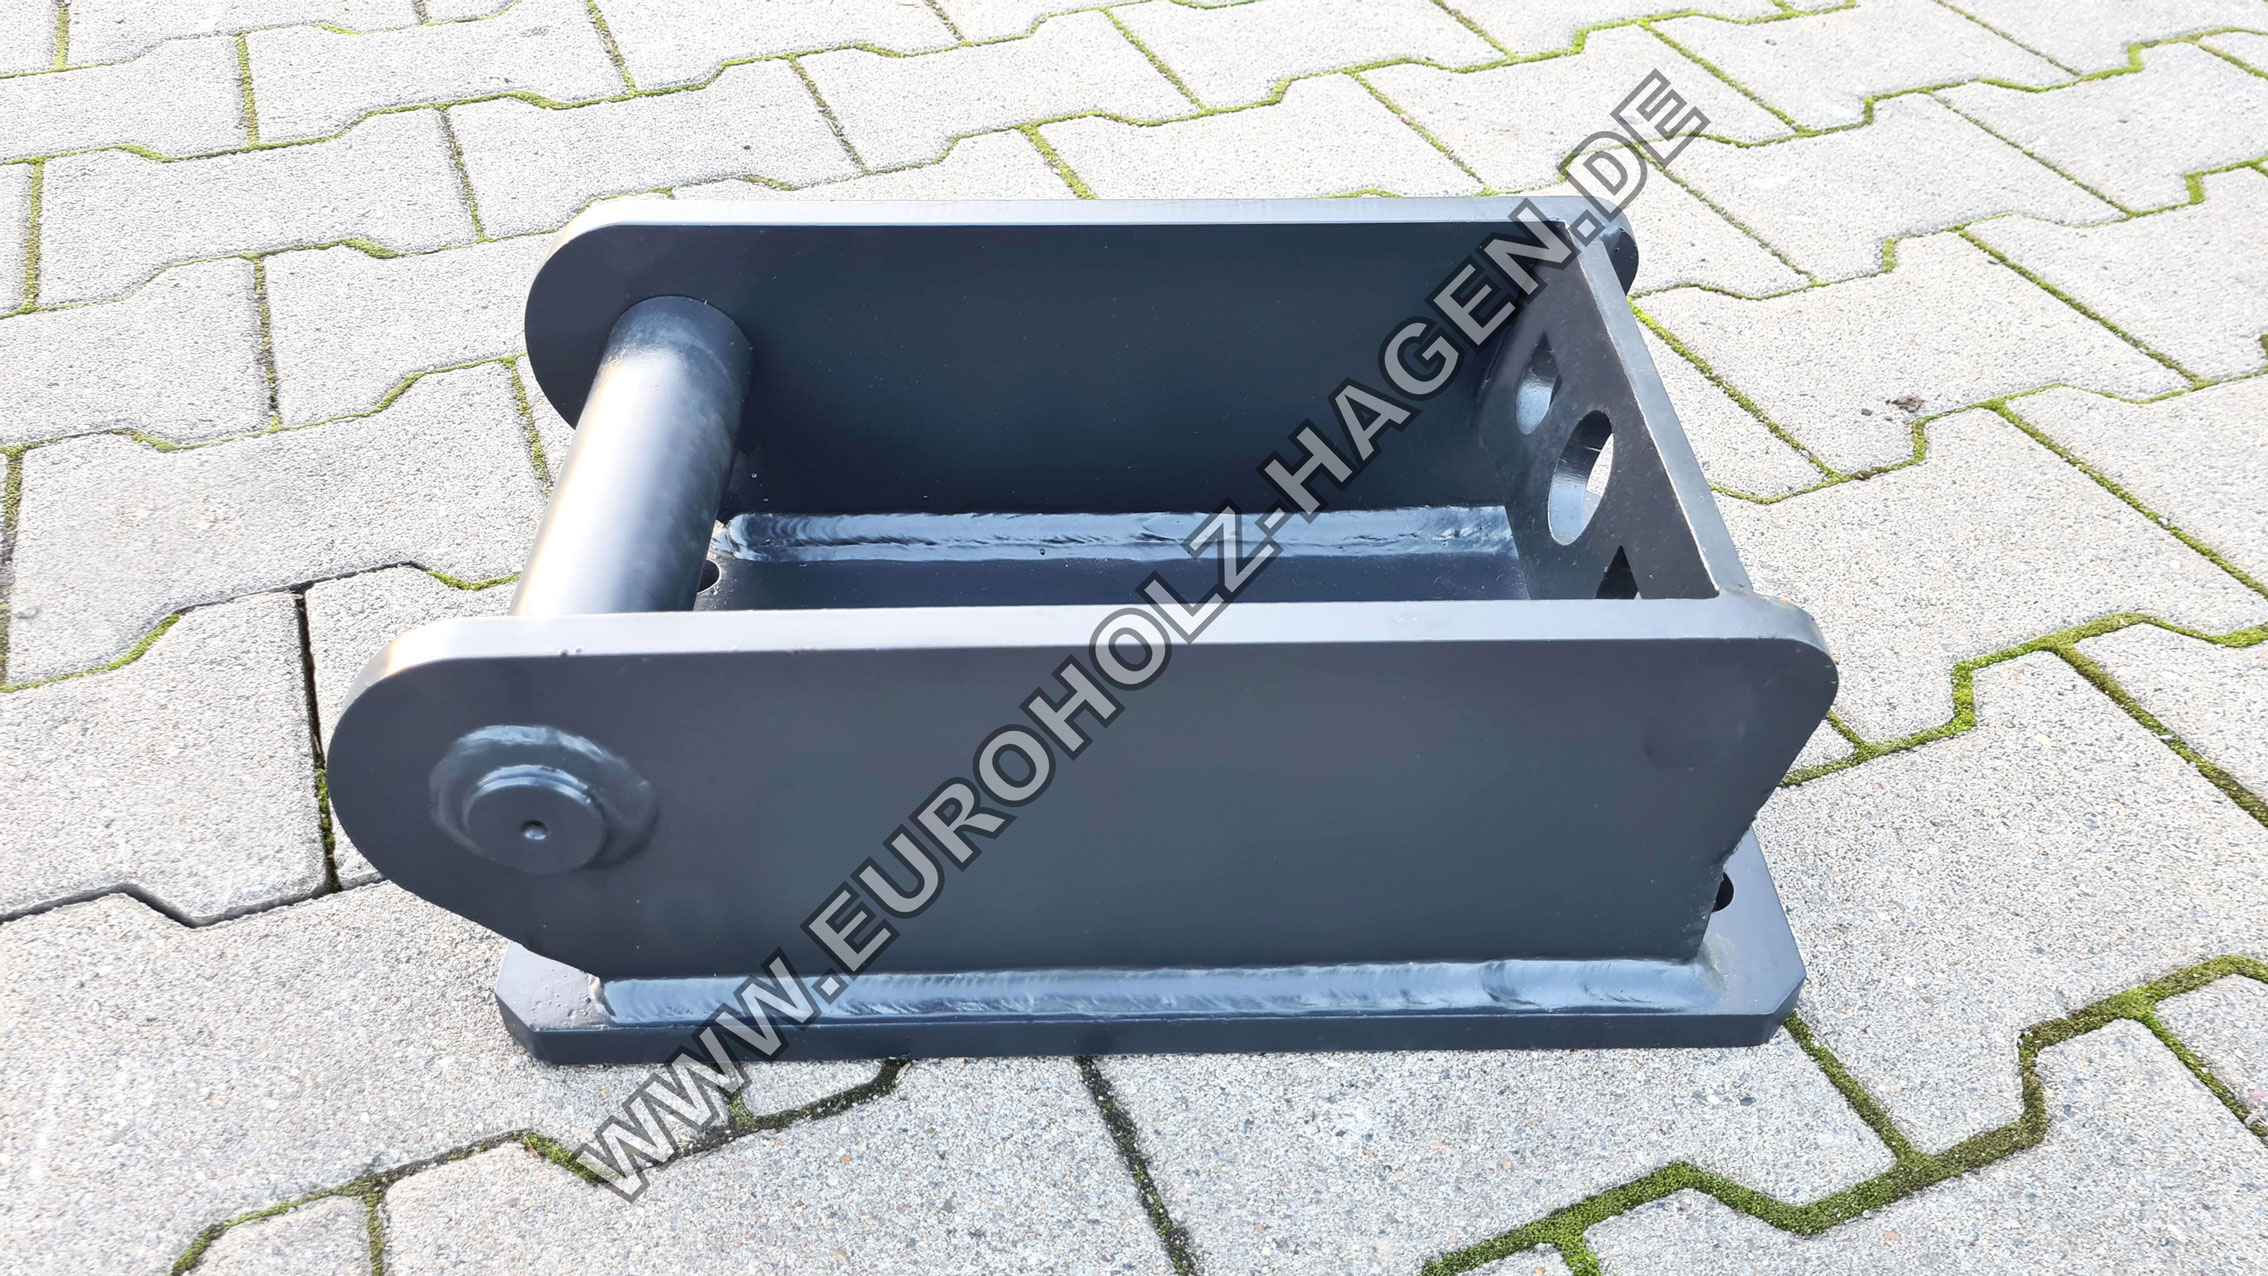 Hammerplatte MS03 Adapterplatte Platte Anbauplatte excavator hammer adapter